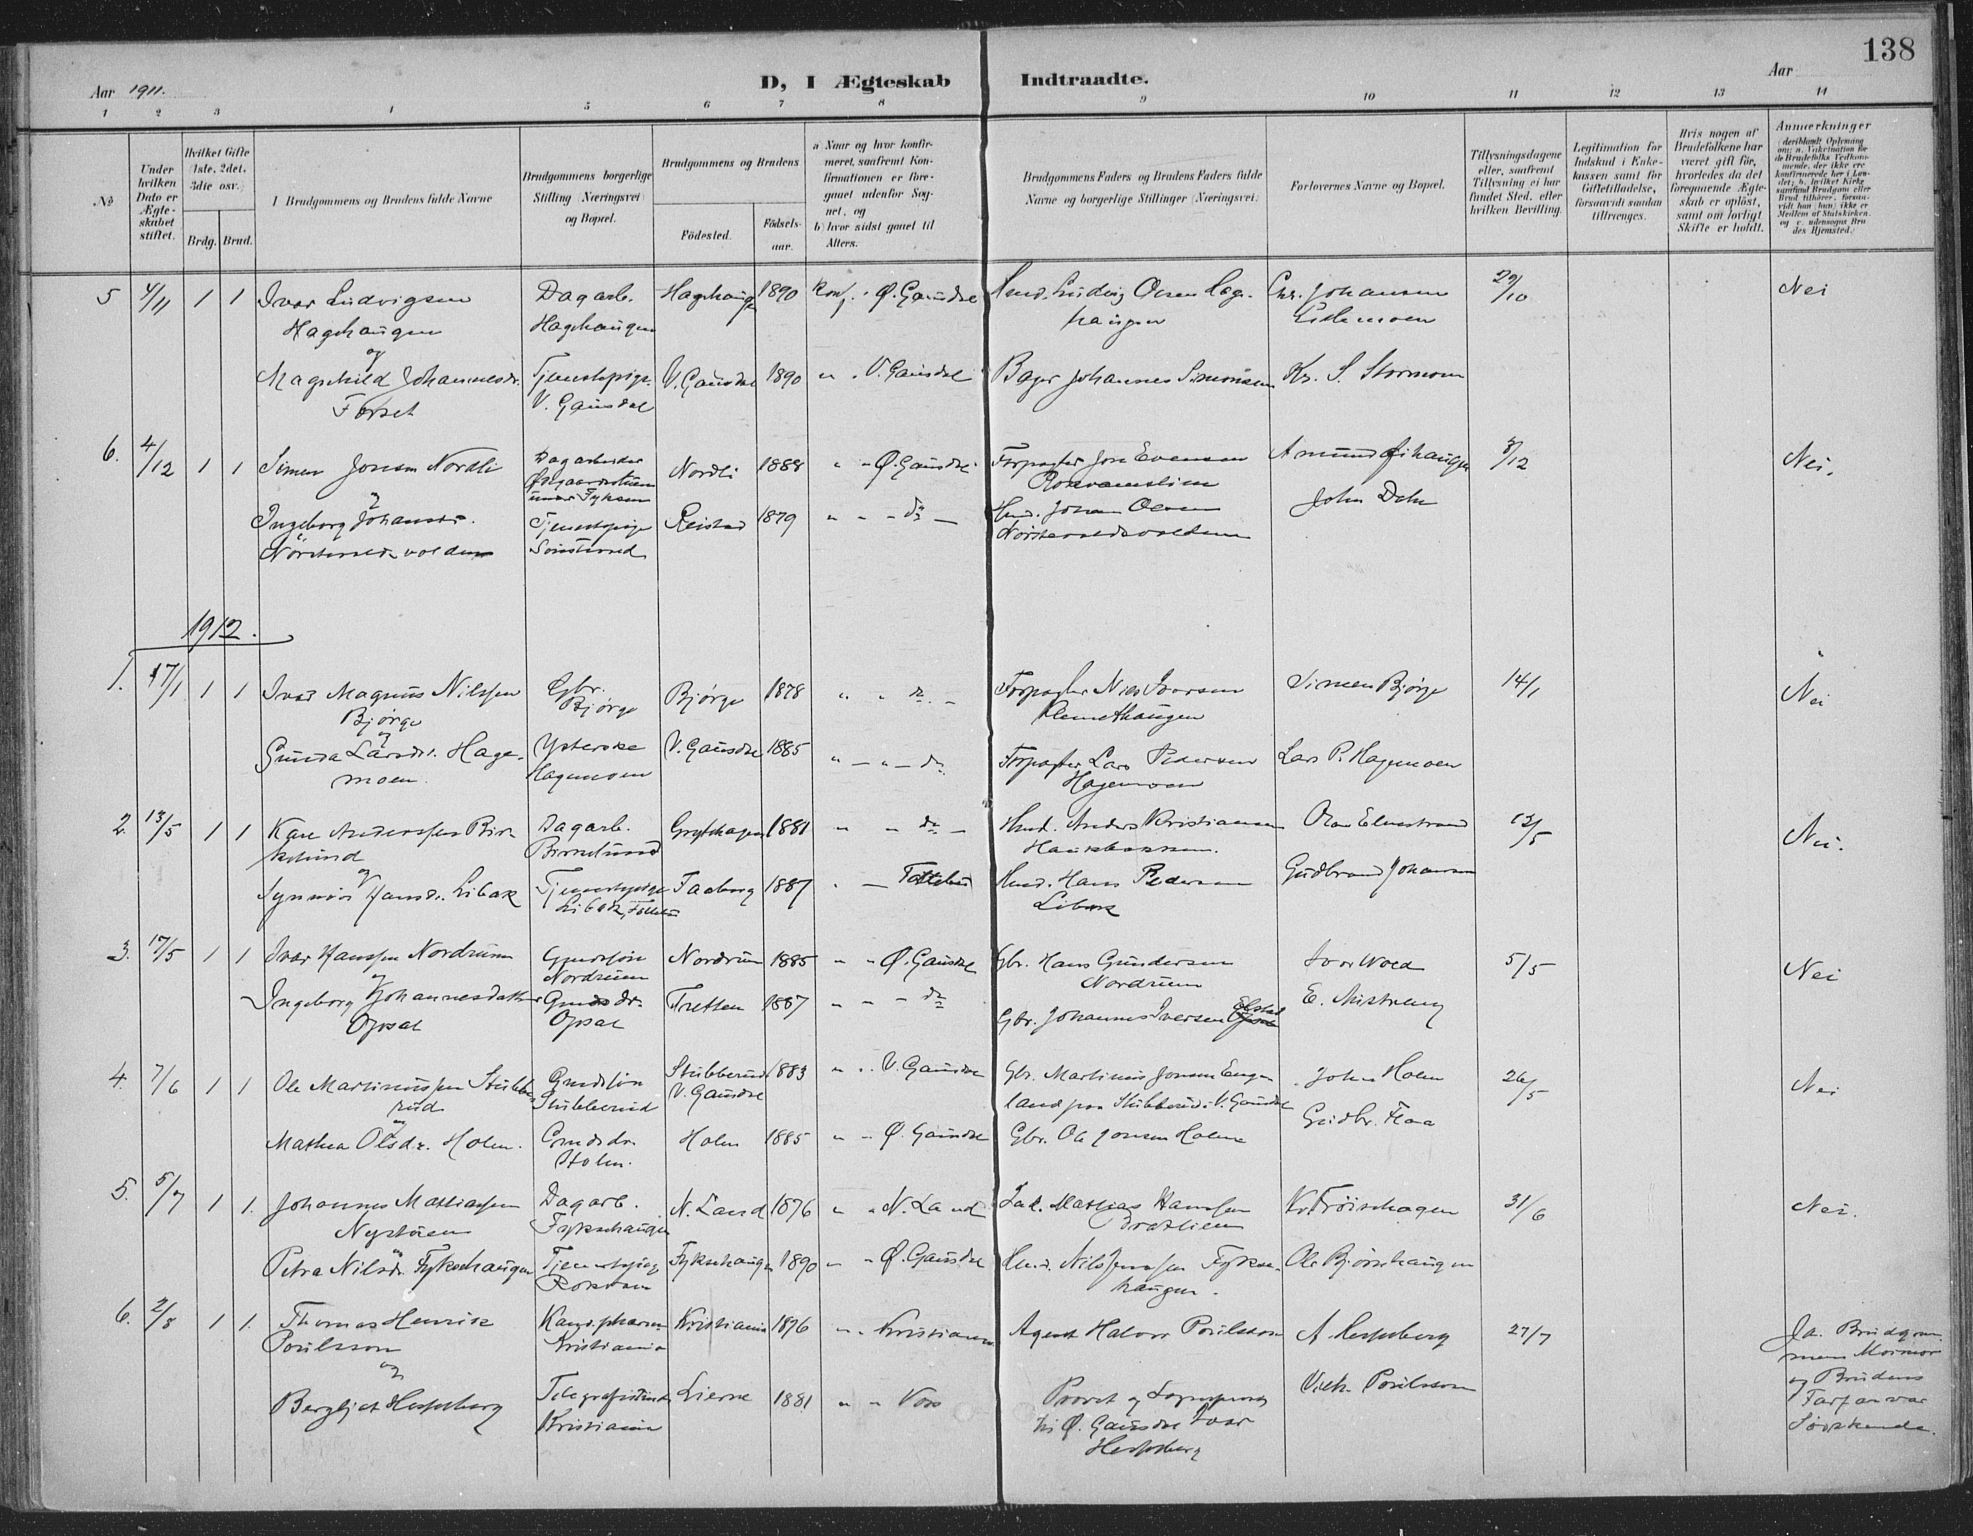 SAH, Østre Gausdal prestekontor, Ministerialbok nr. 4, 1898-1914, s. 138